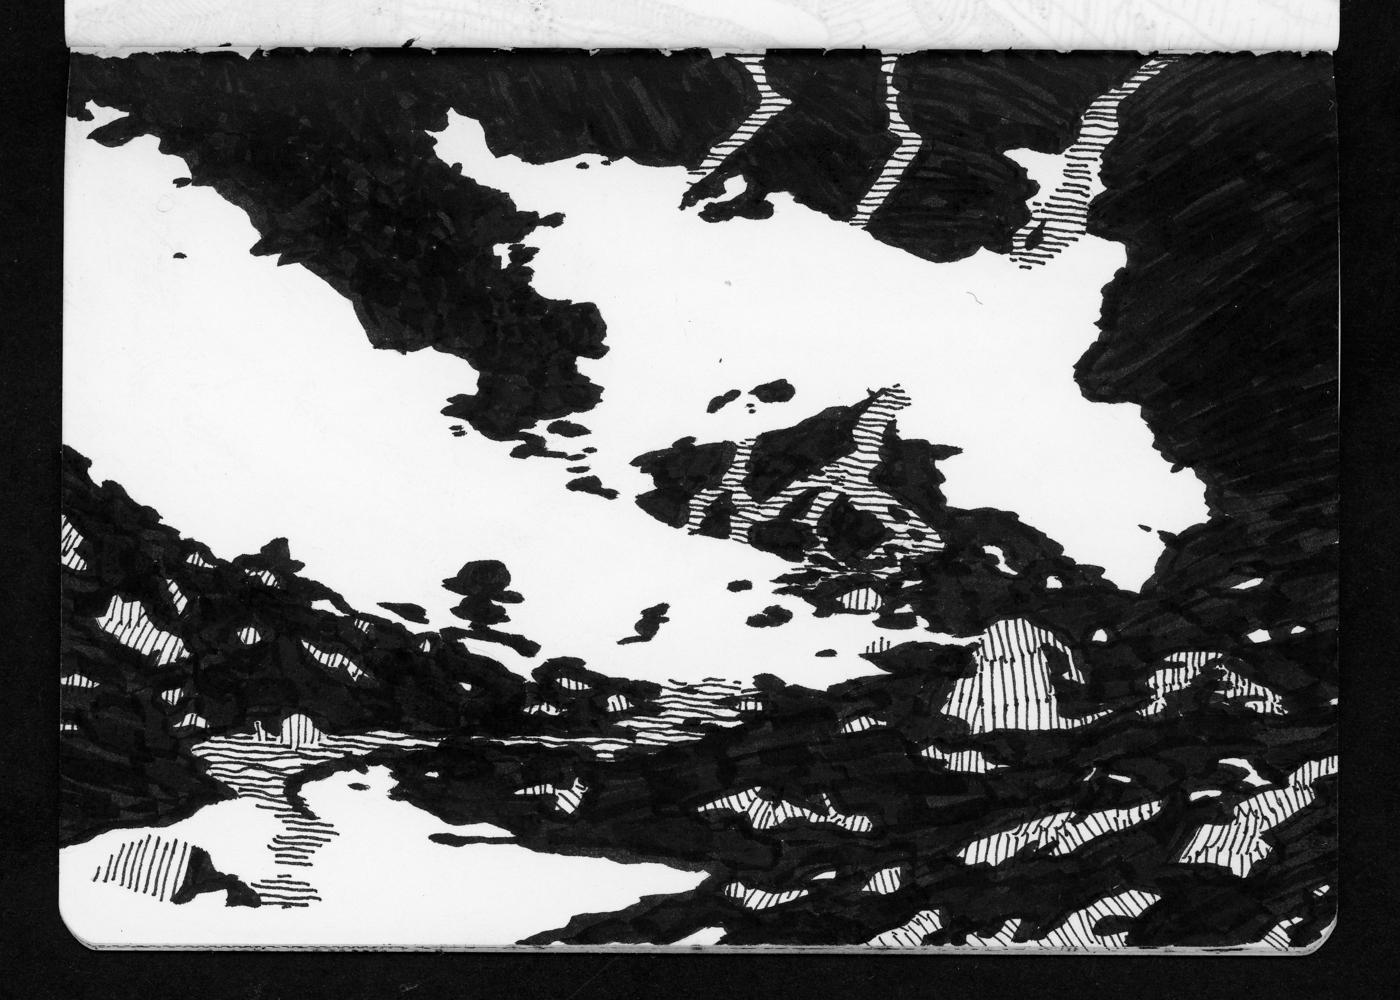 05-20 Melting snowpiles and stream below Lake Edna.jpg